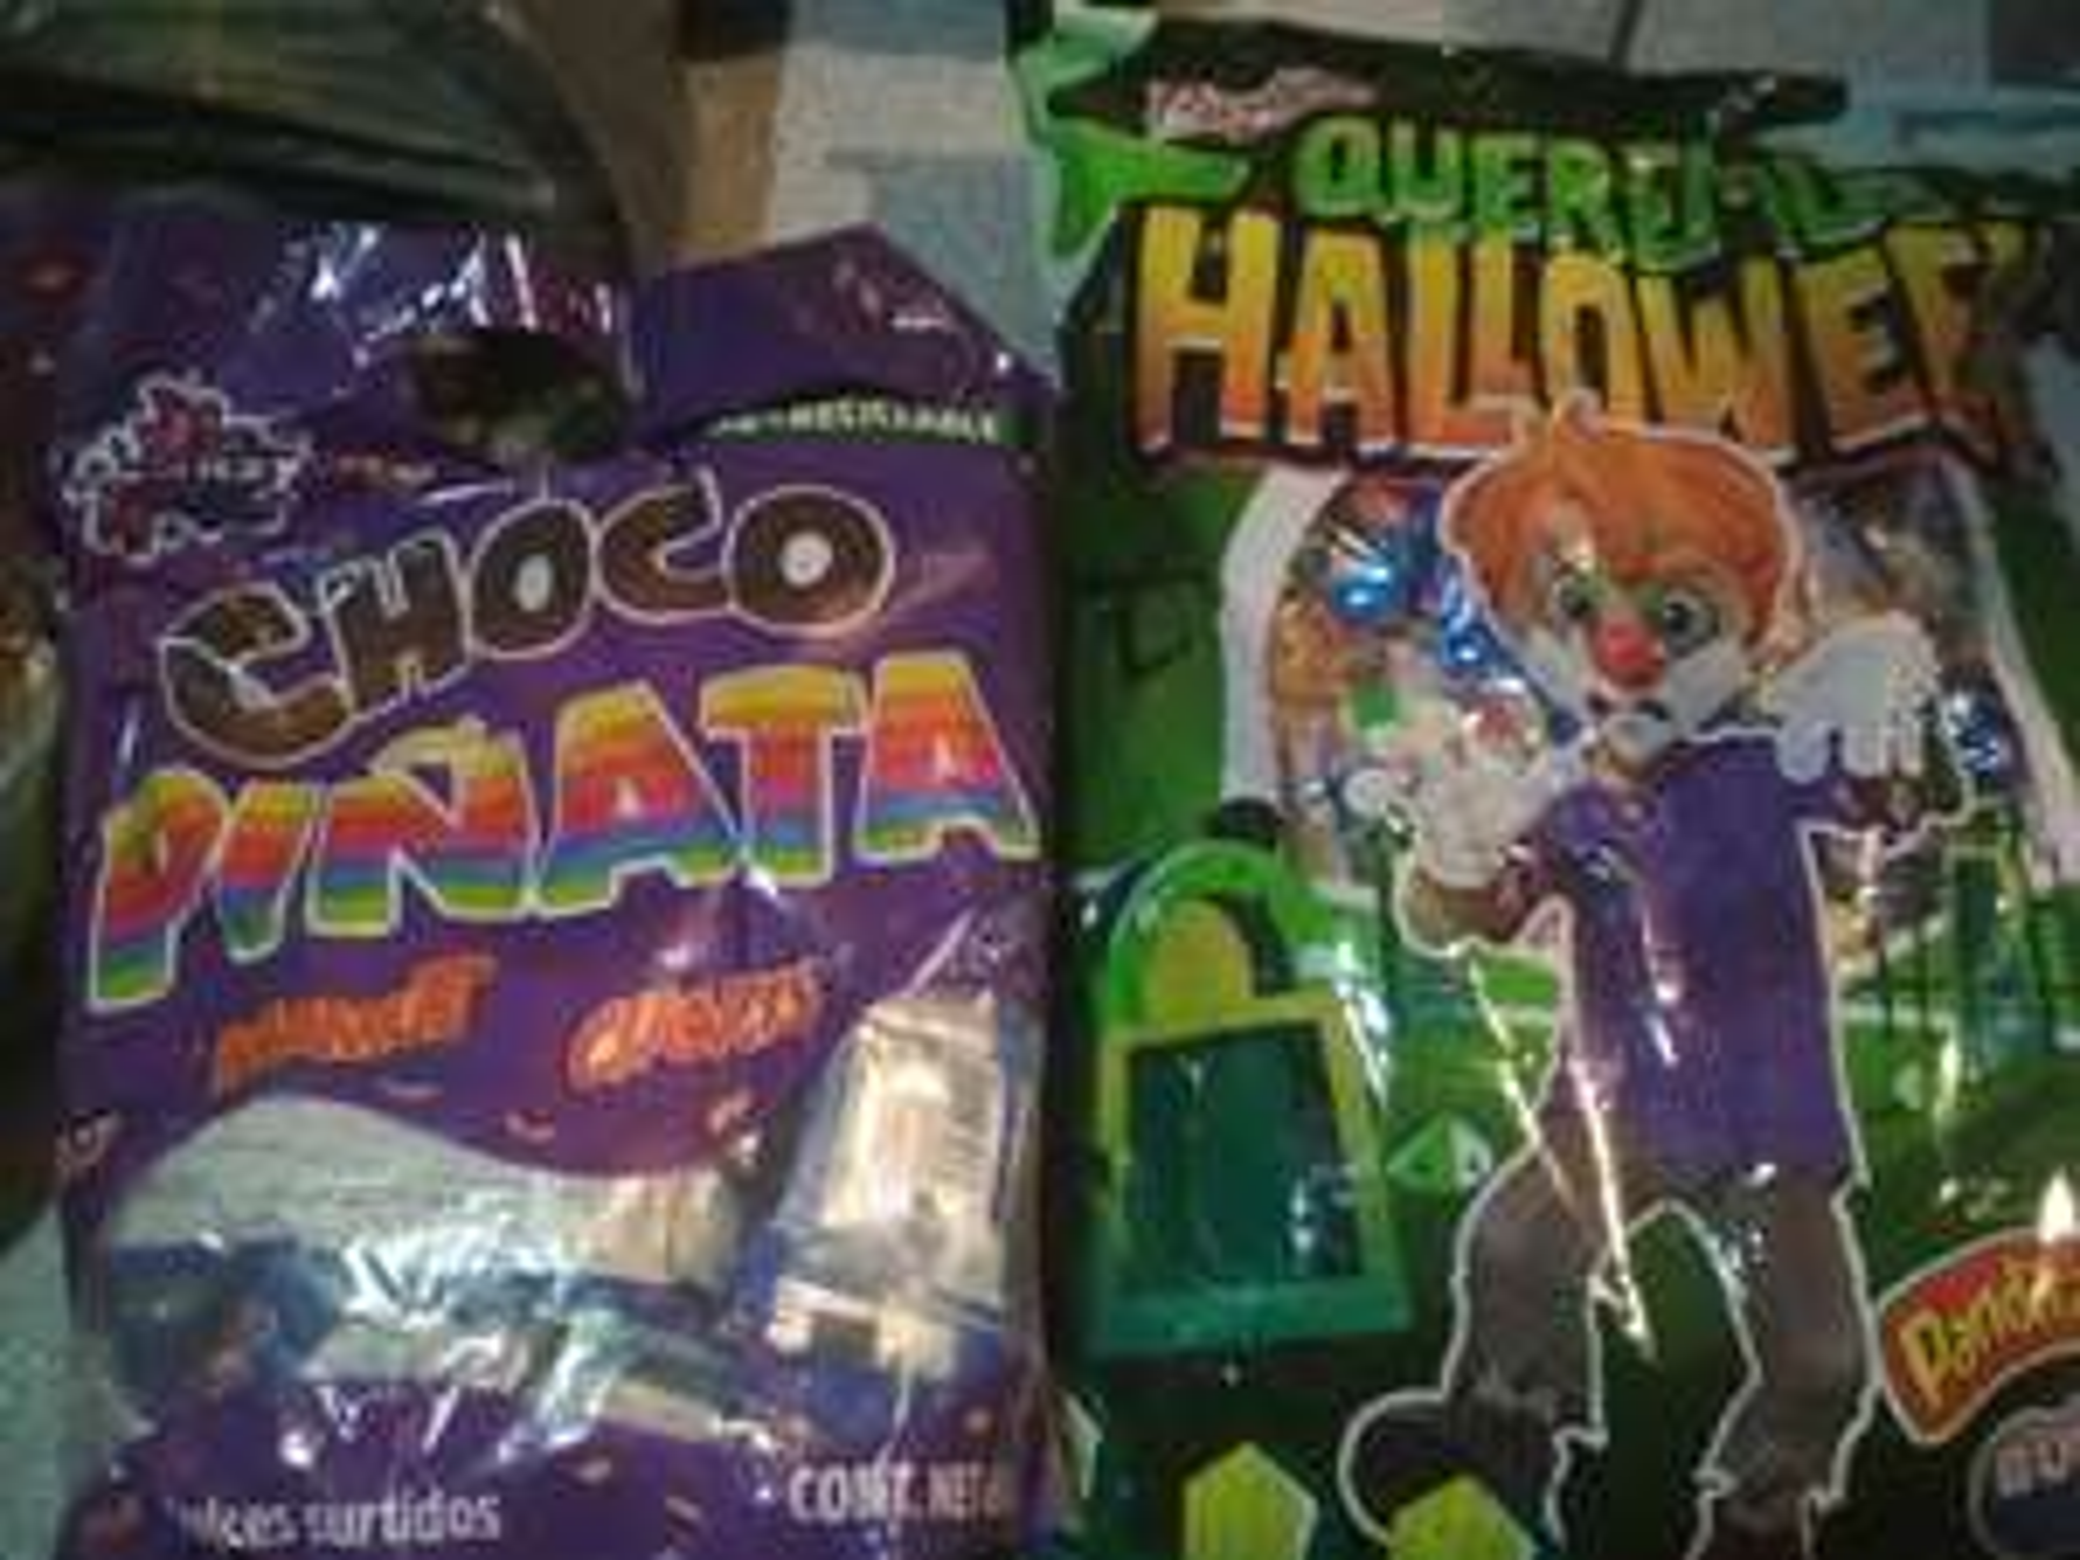 Walmart San Pedro: choco piñata y ricolino halloween